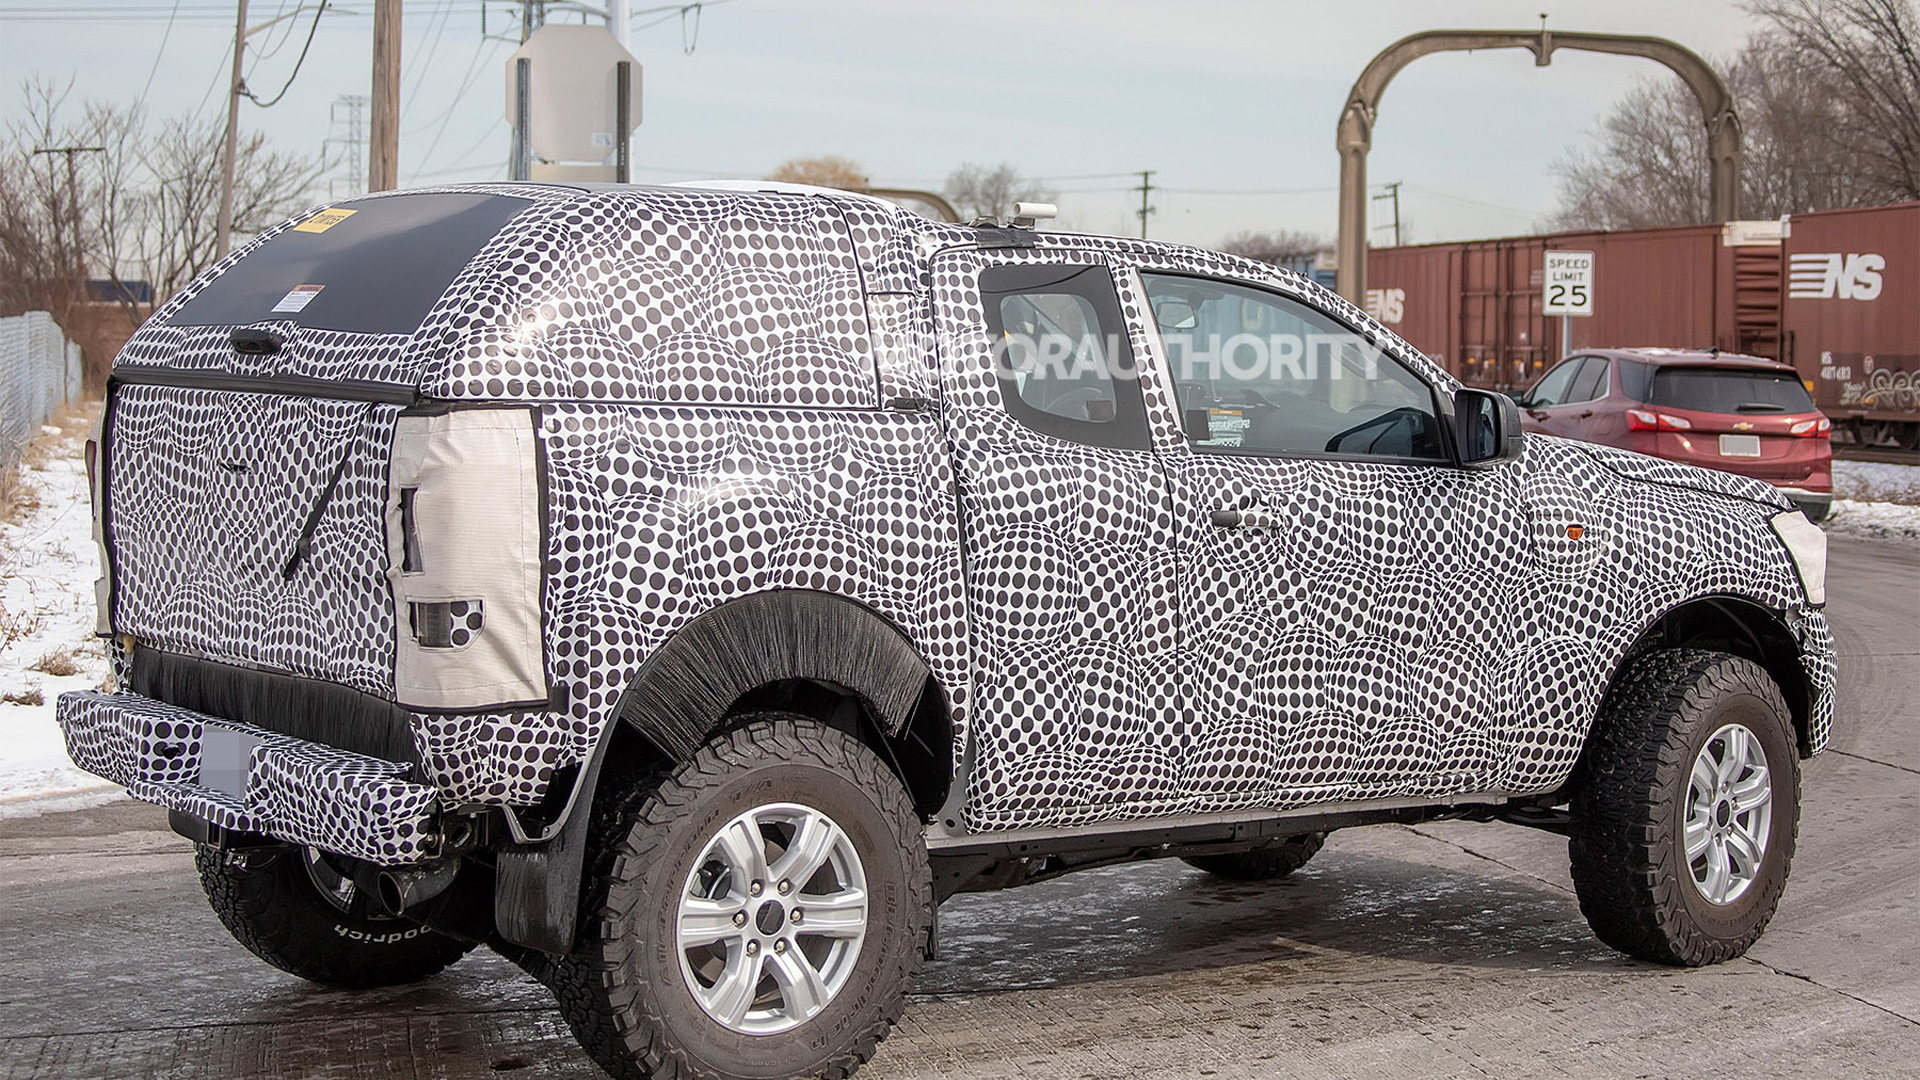 2021 Ford Bronco test mule spy shots - Image via S. Baldauf/SB-Medien